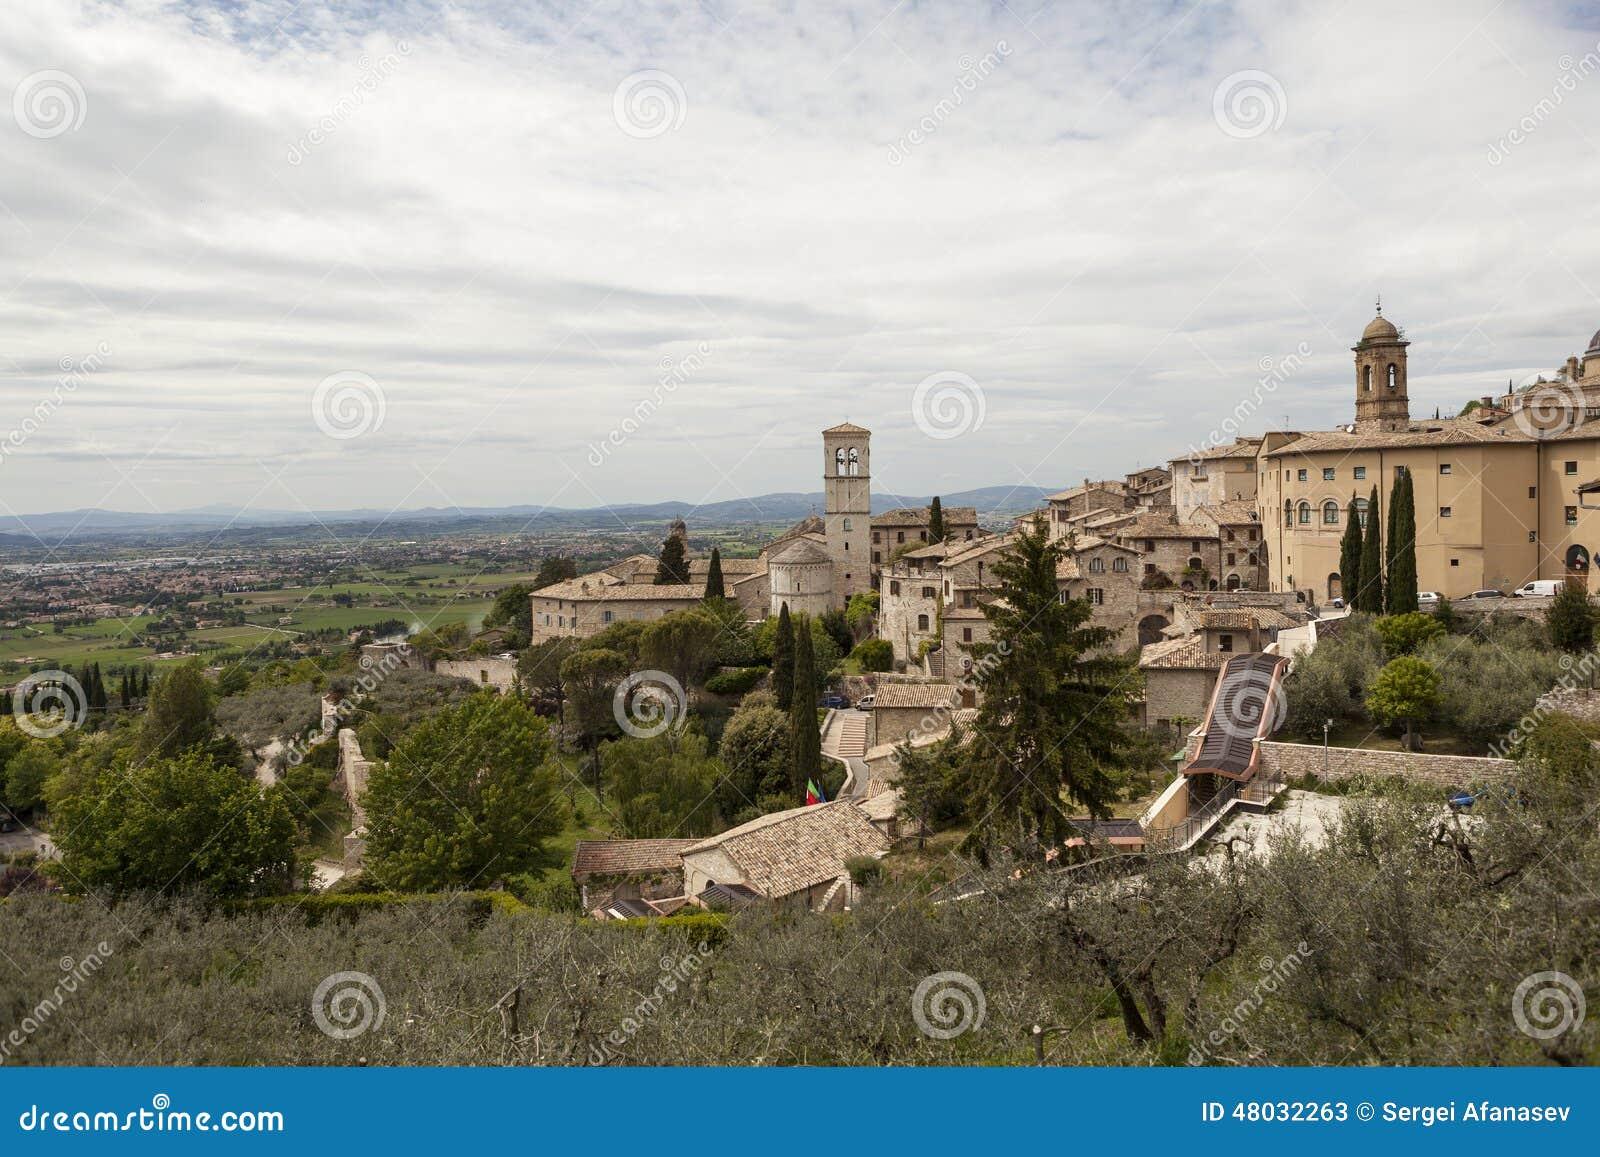 Map Of Gubbio Umbria Italy Stock Image Image Of Gubbio Italy